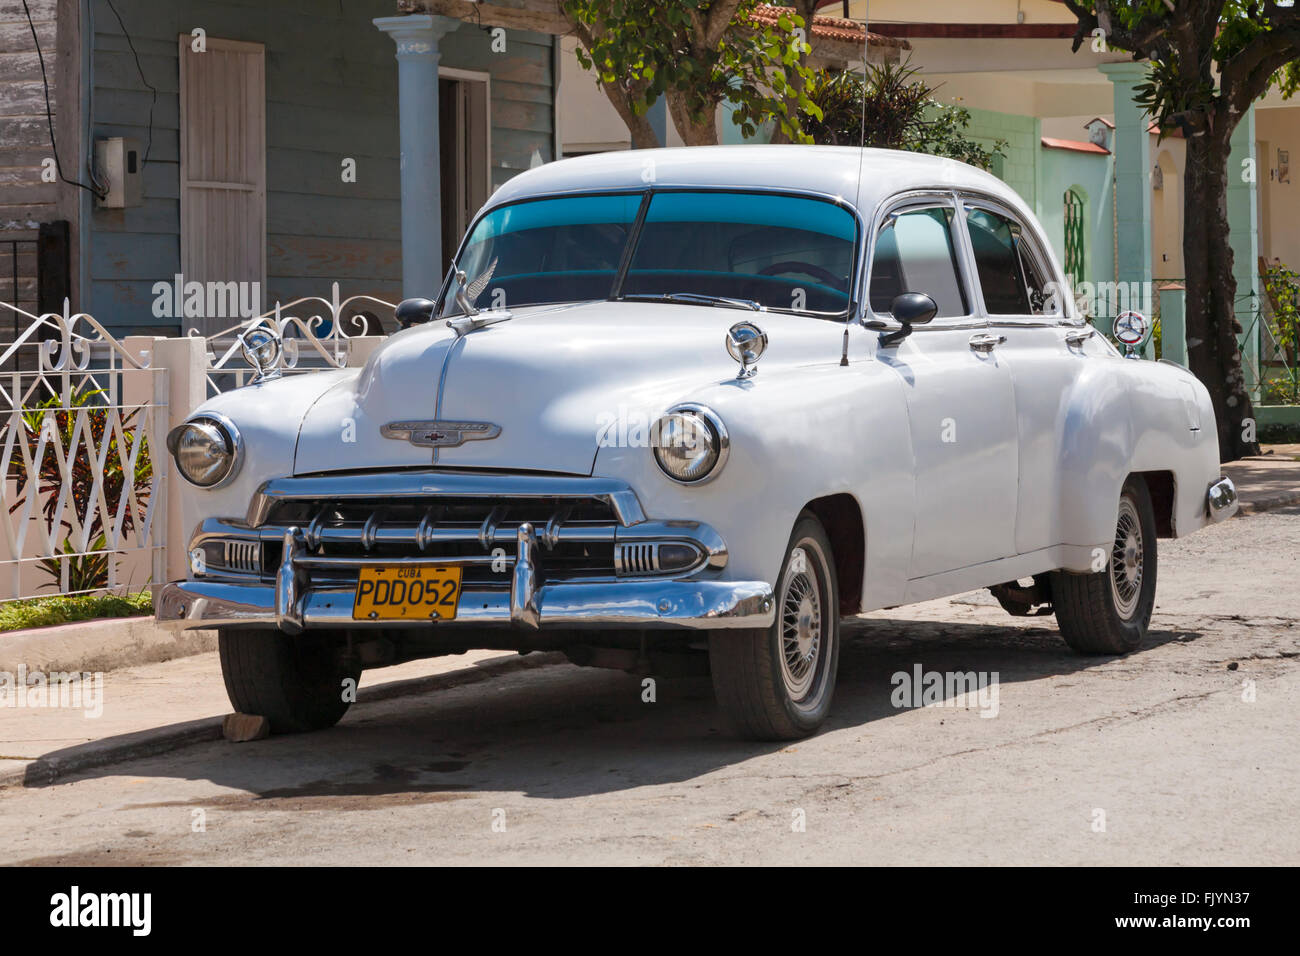 Old chevrolet car at Vinales, Pinar del Rio Province, Cuba, West ...